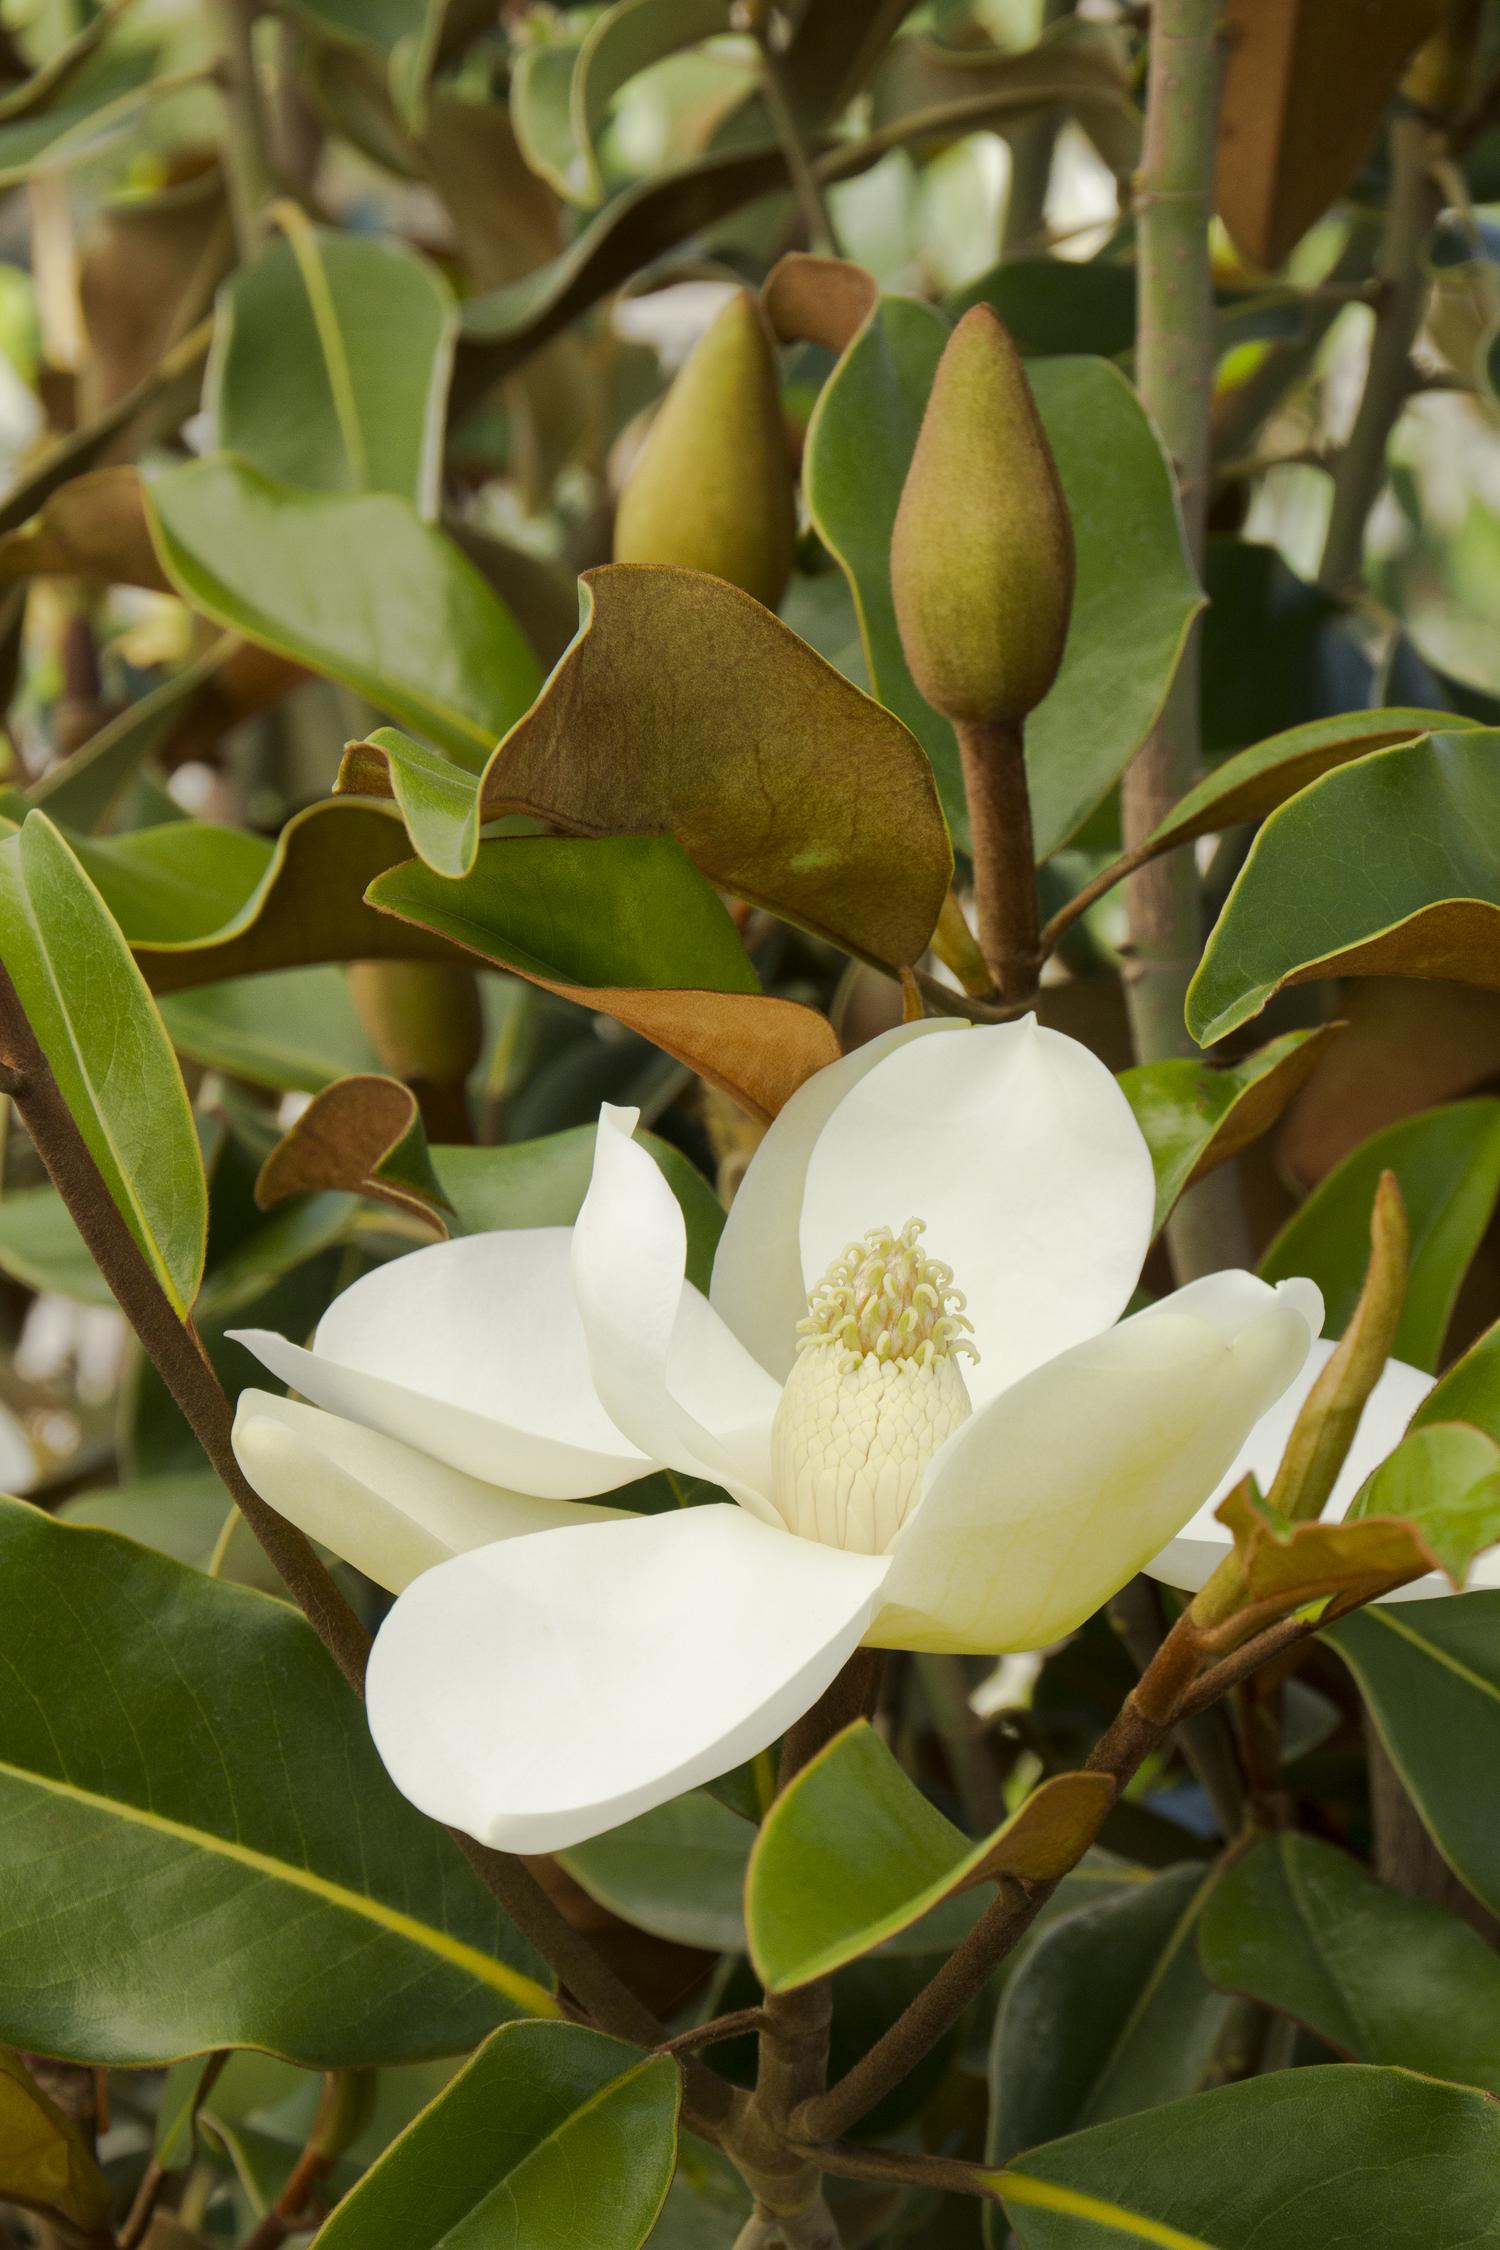 Bracken S Brown Beauty Magnolia Monrovia Bracken S Brown